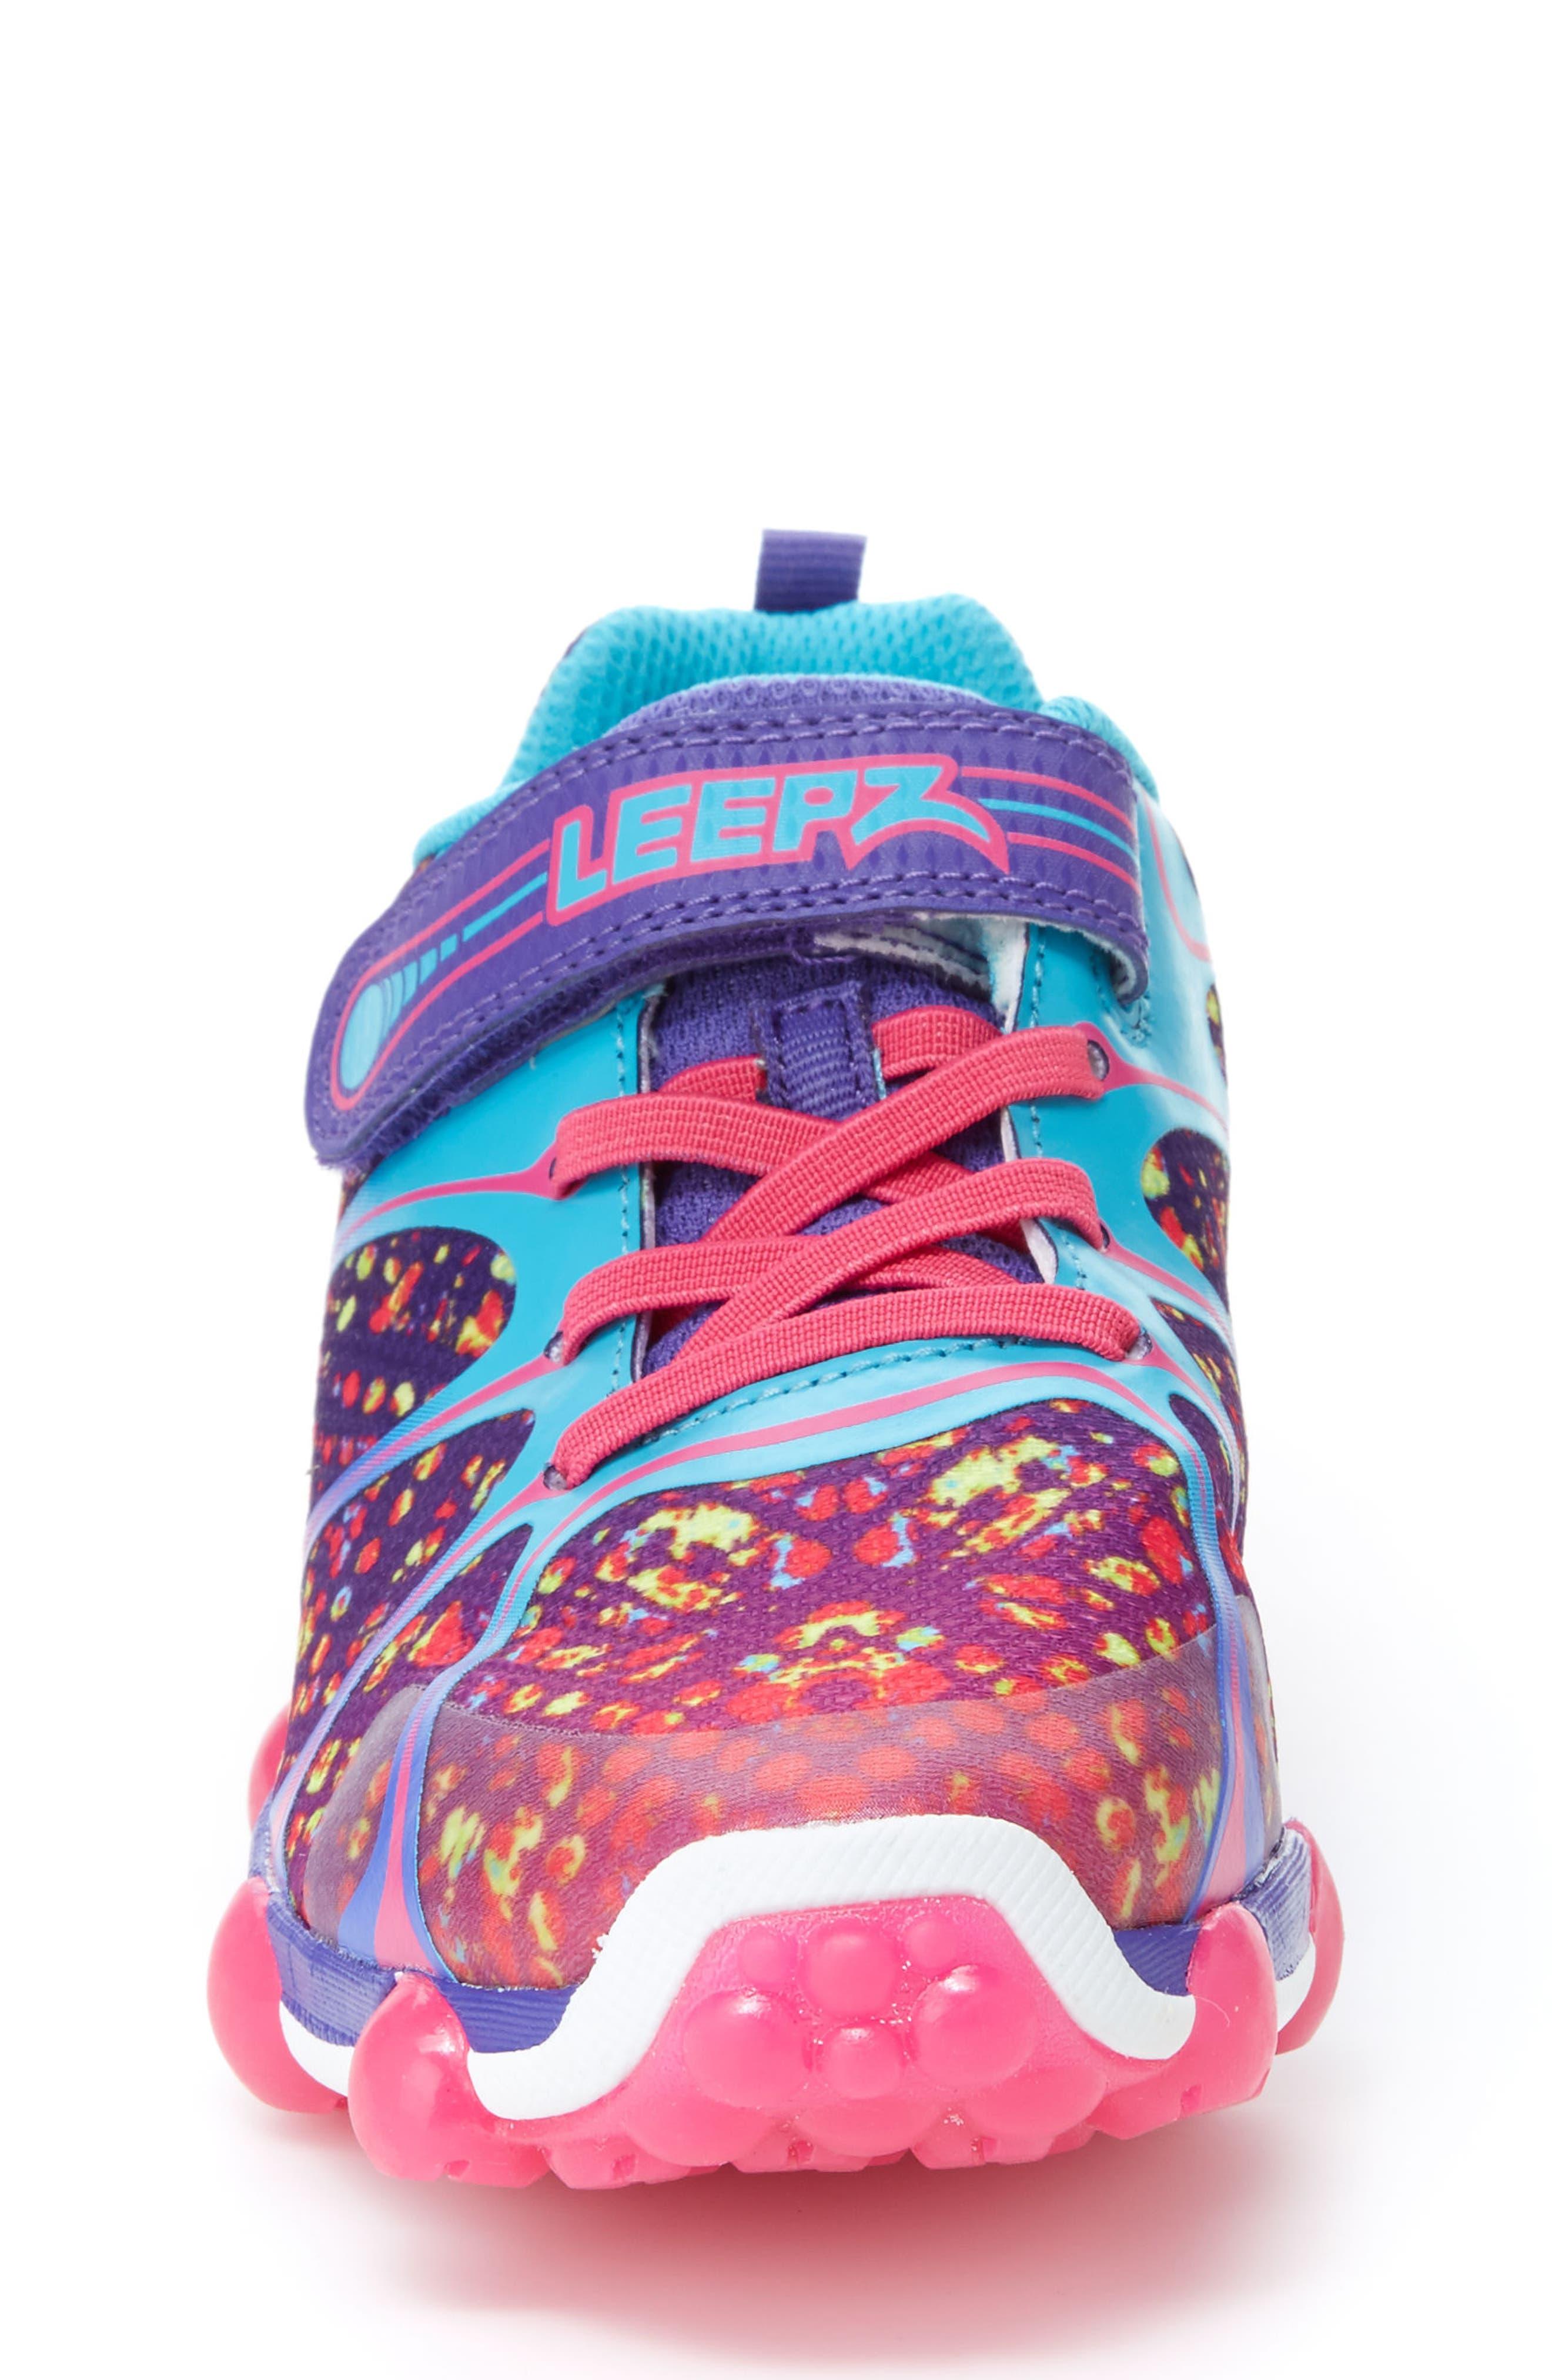 'Leepz' Light-Up Sneaker,                             Alternate thumbnail 4, color,                             540